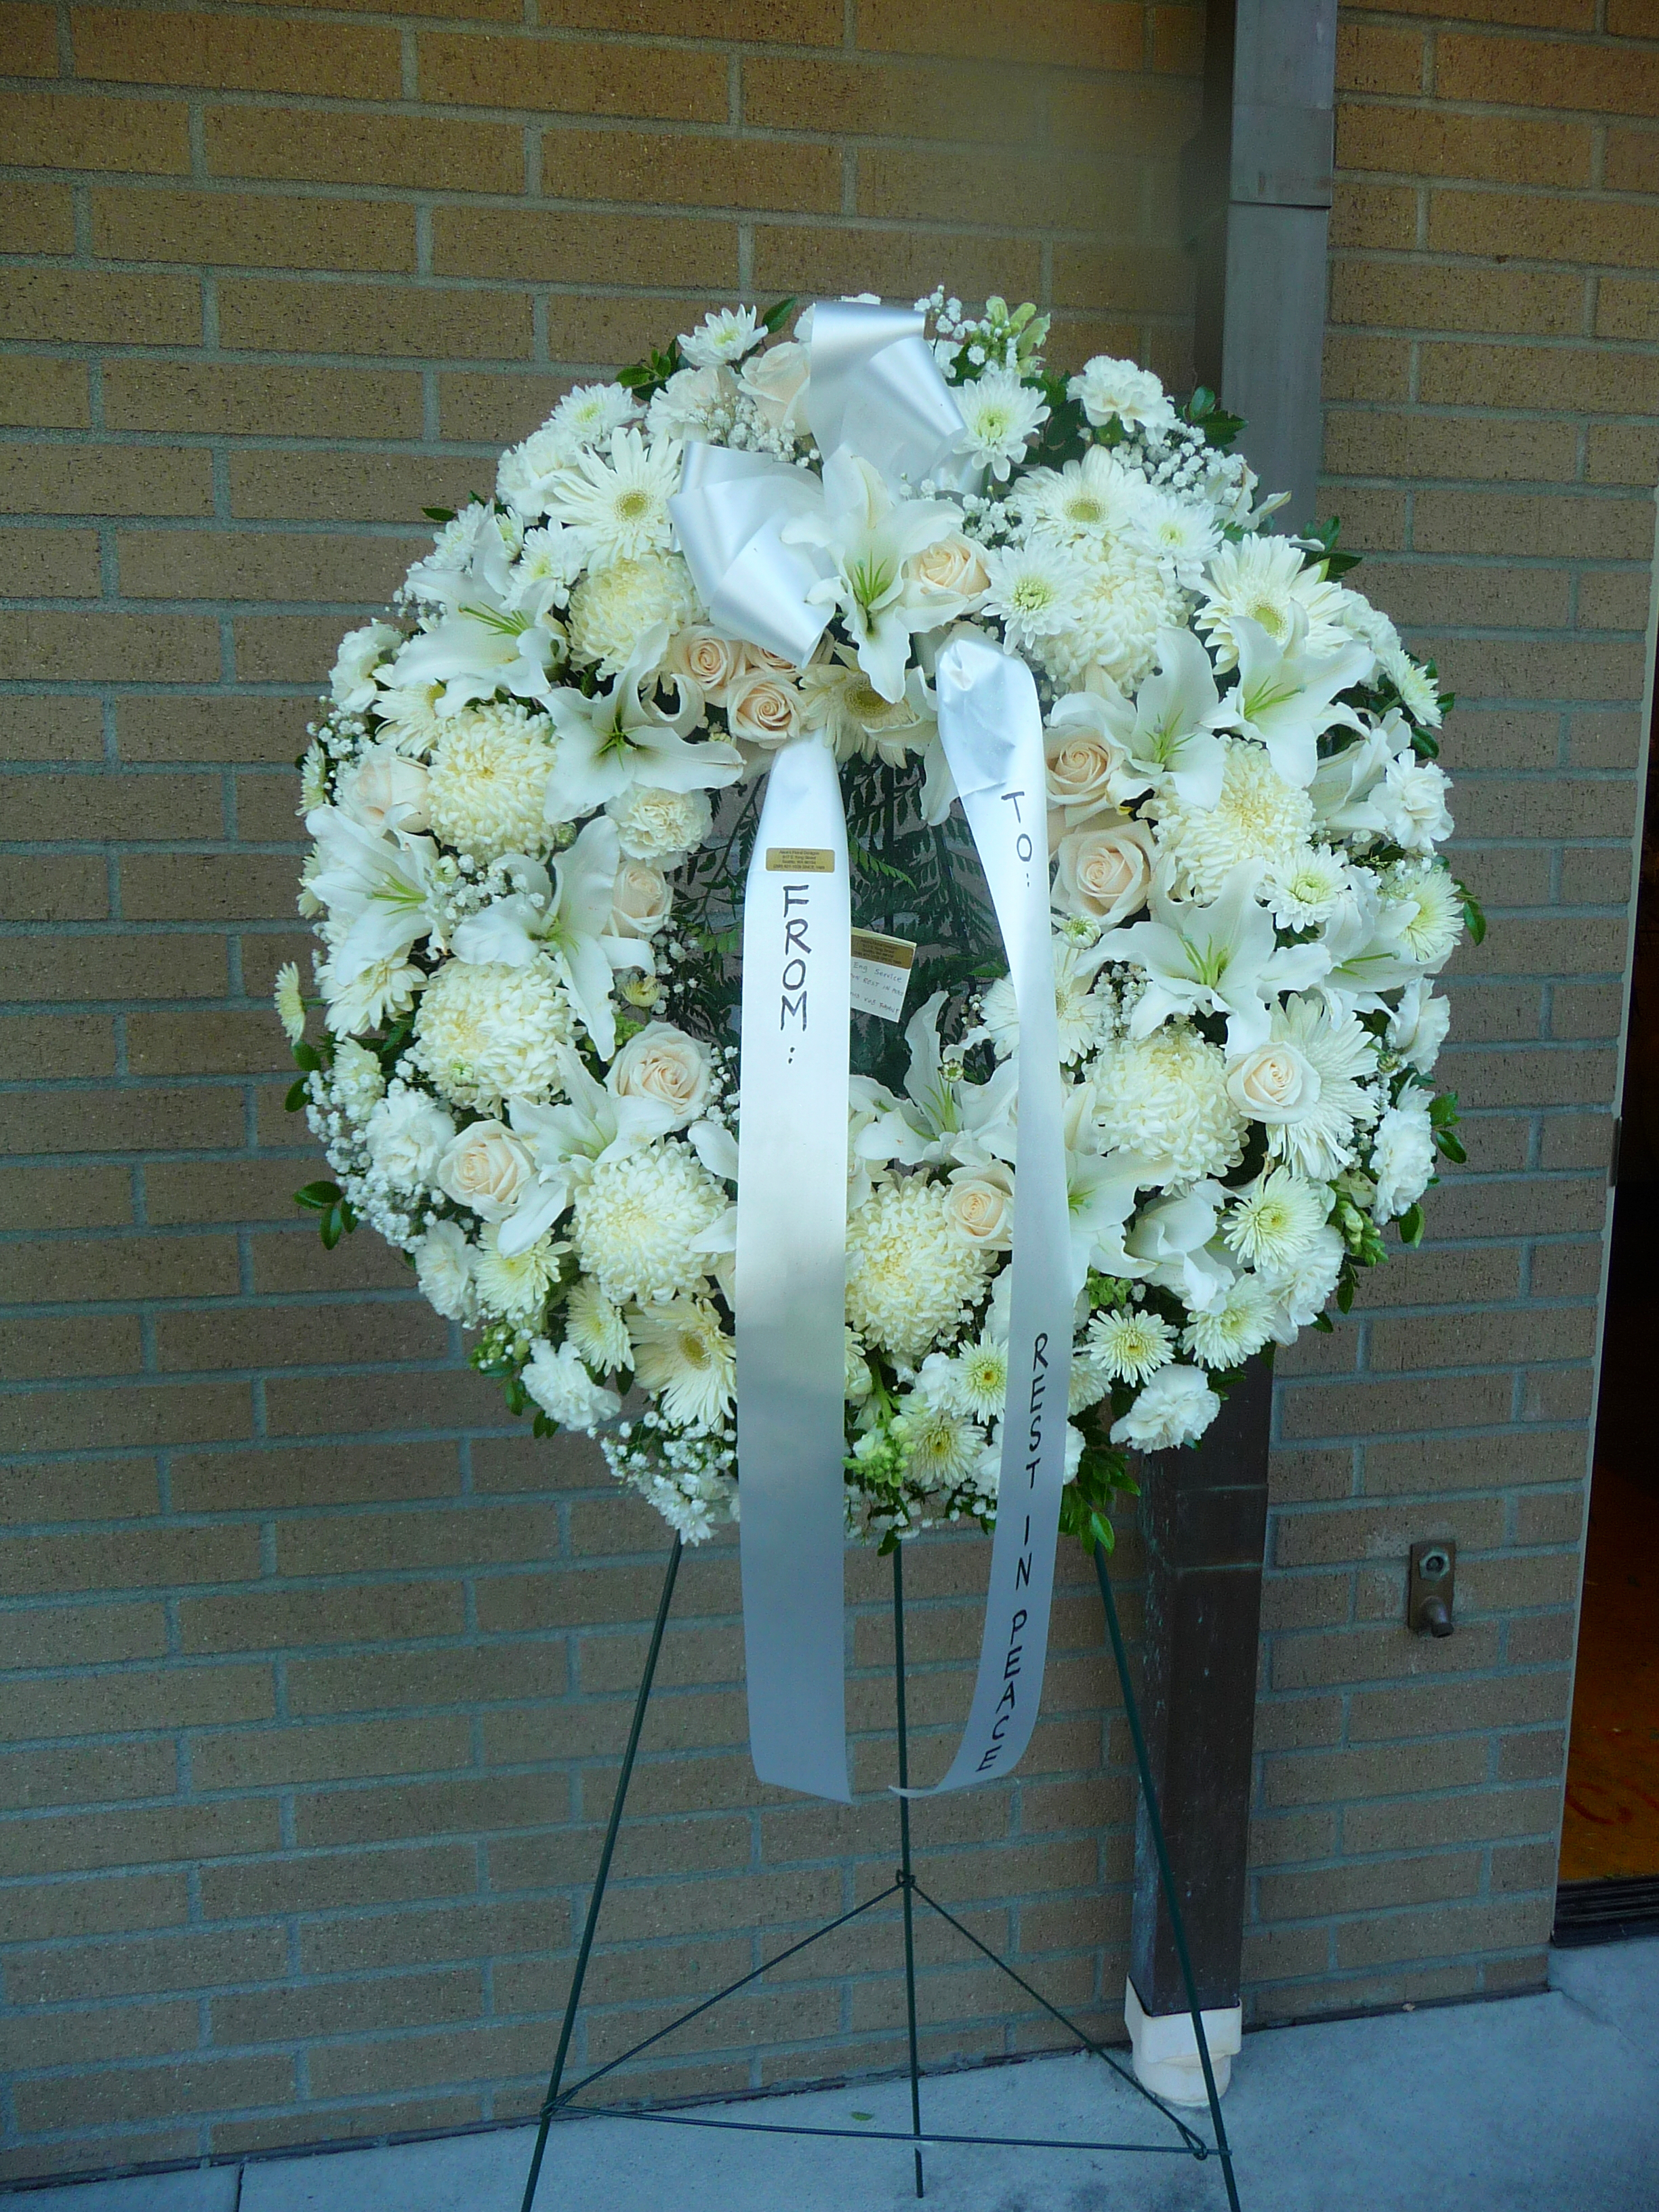 At Peace Wreath (W-15)